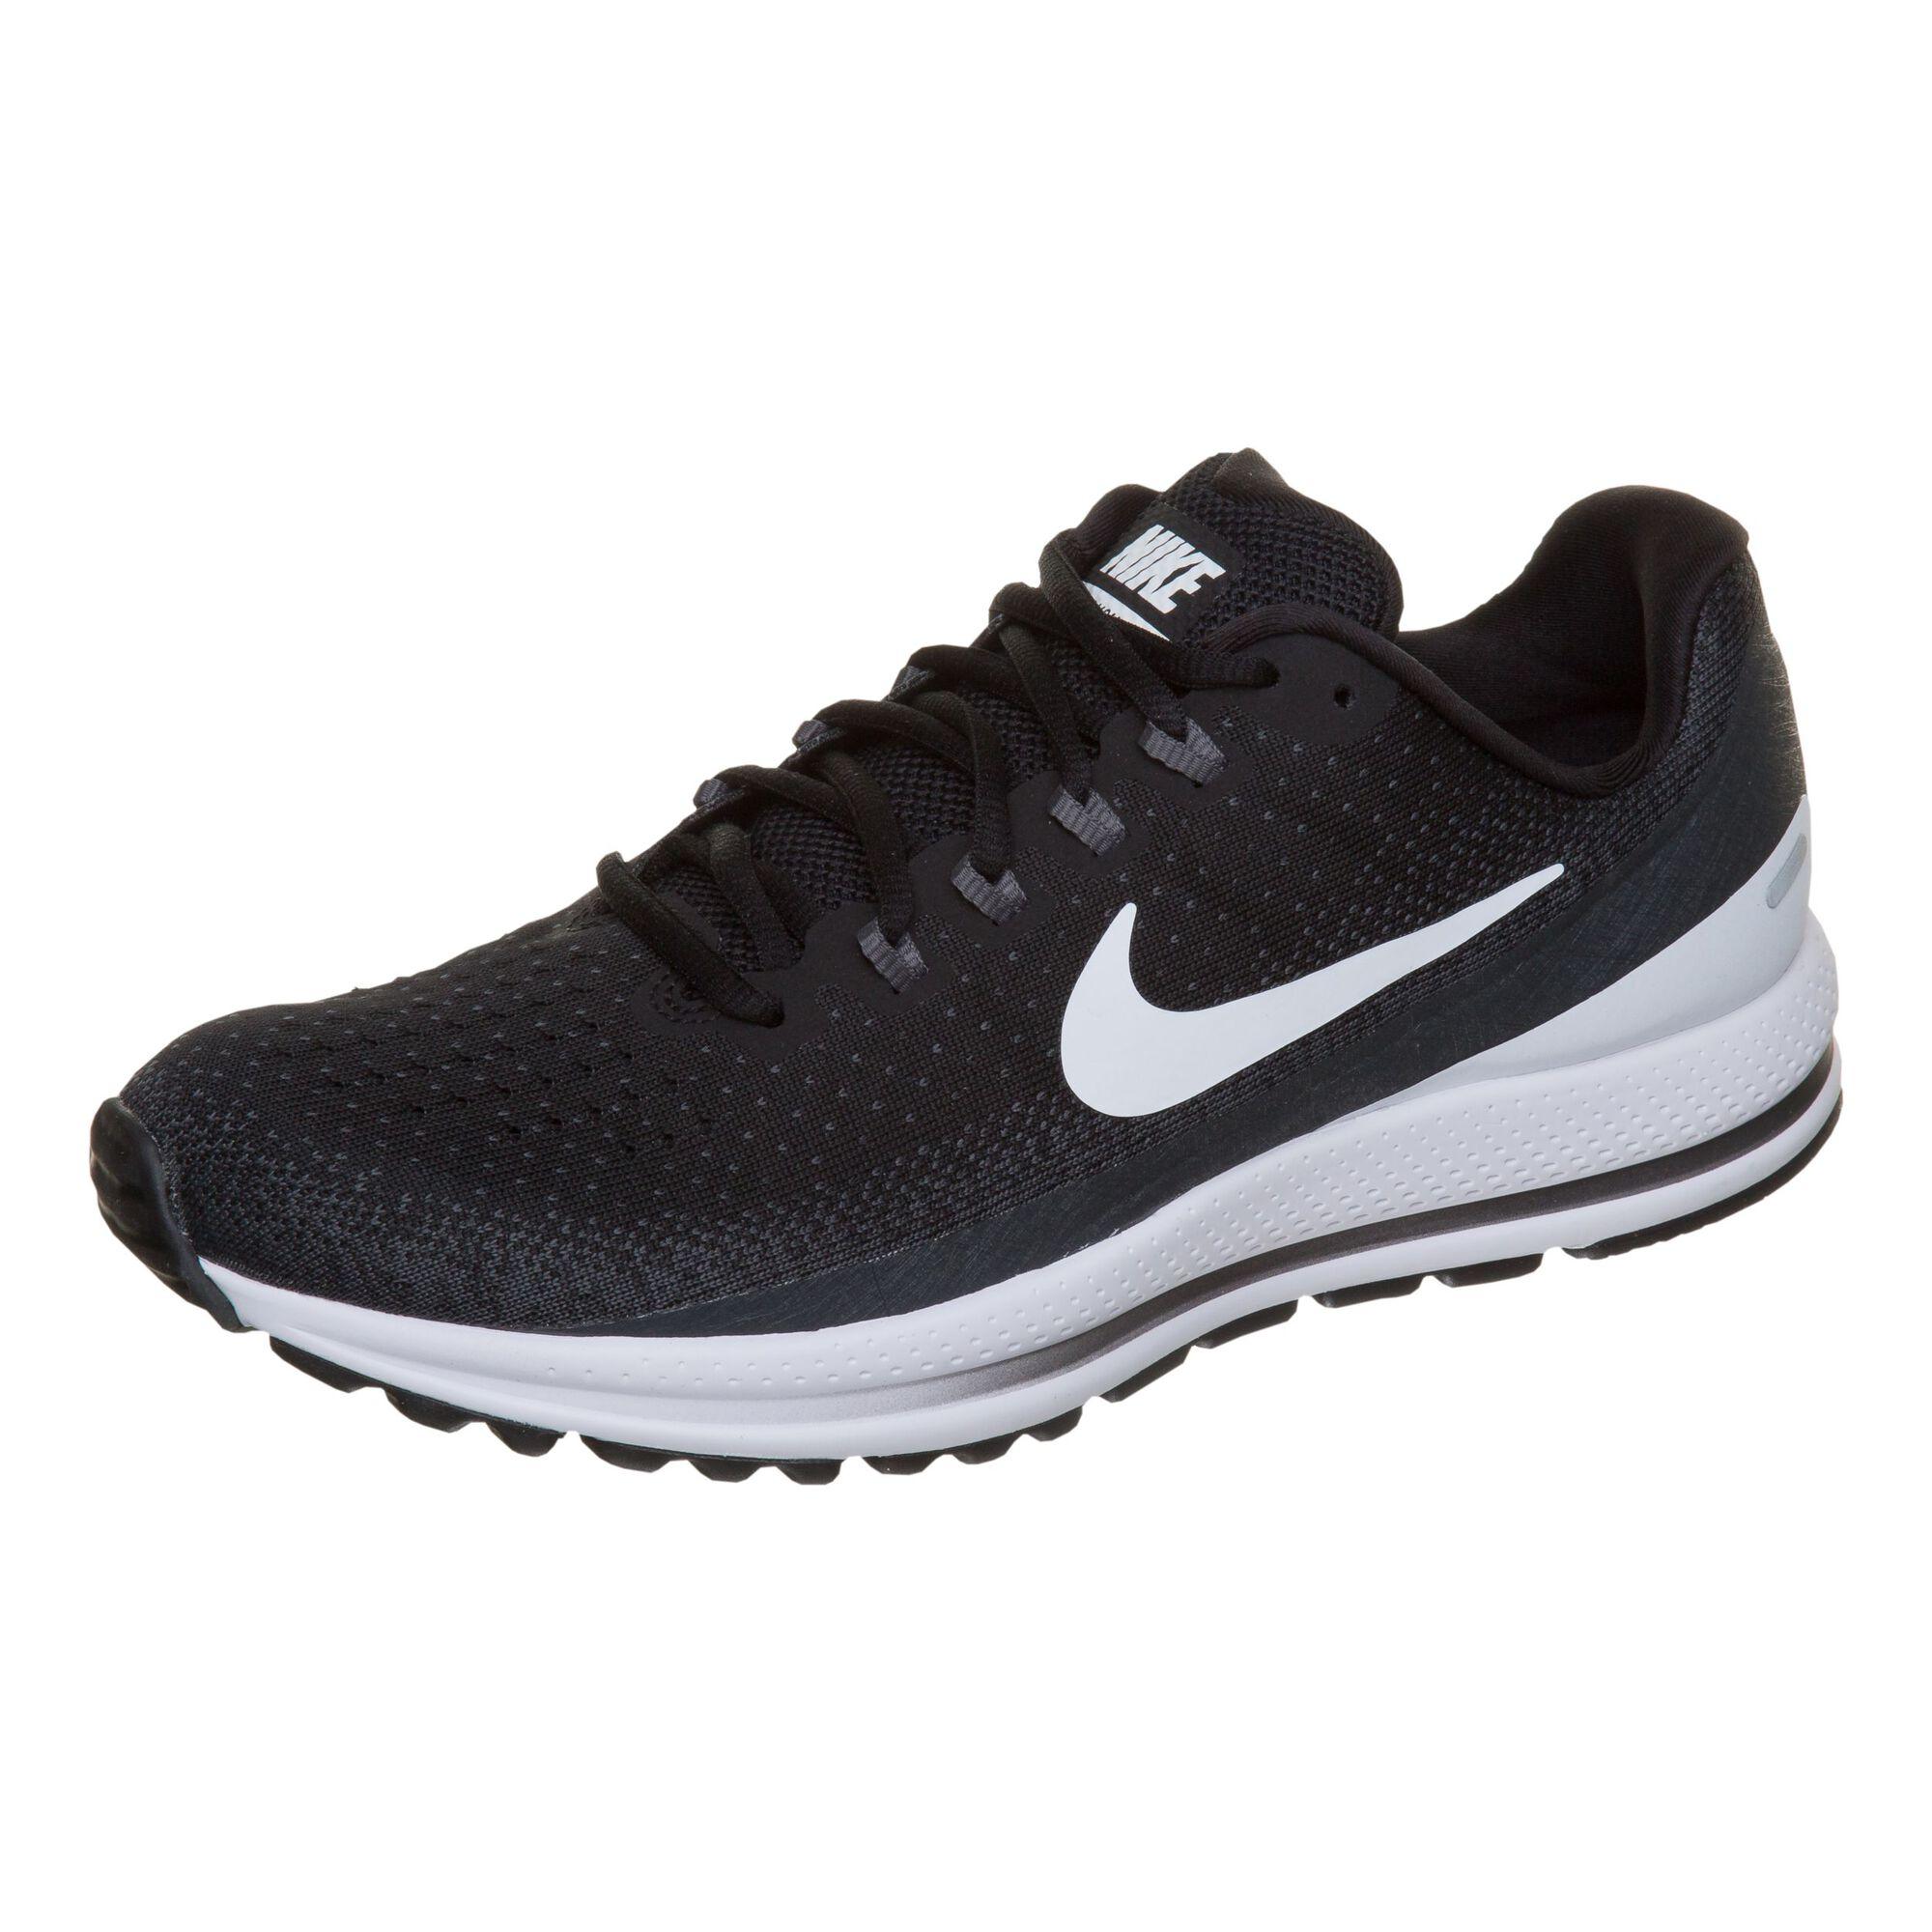 927f29112bad Nike  Nike  Nike  Nike  Nike  Nike  Nike  Nike  Nike  Nike. Air Zoom Vomero  13 ...